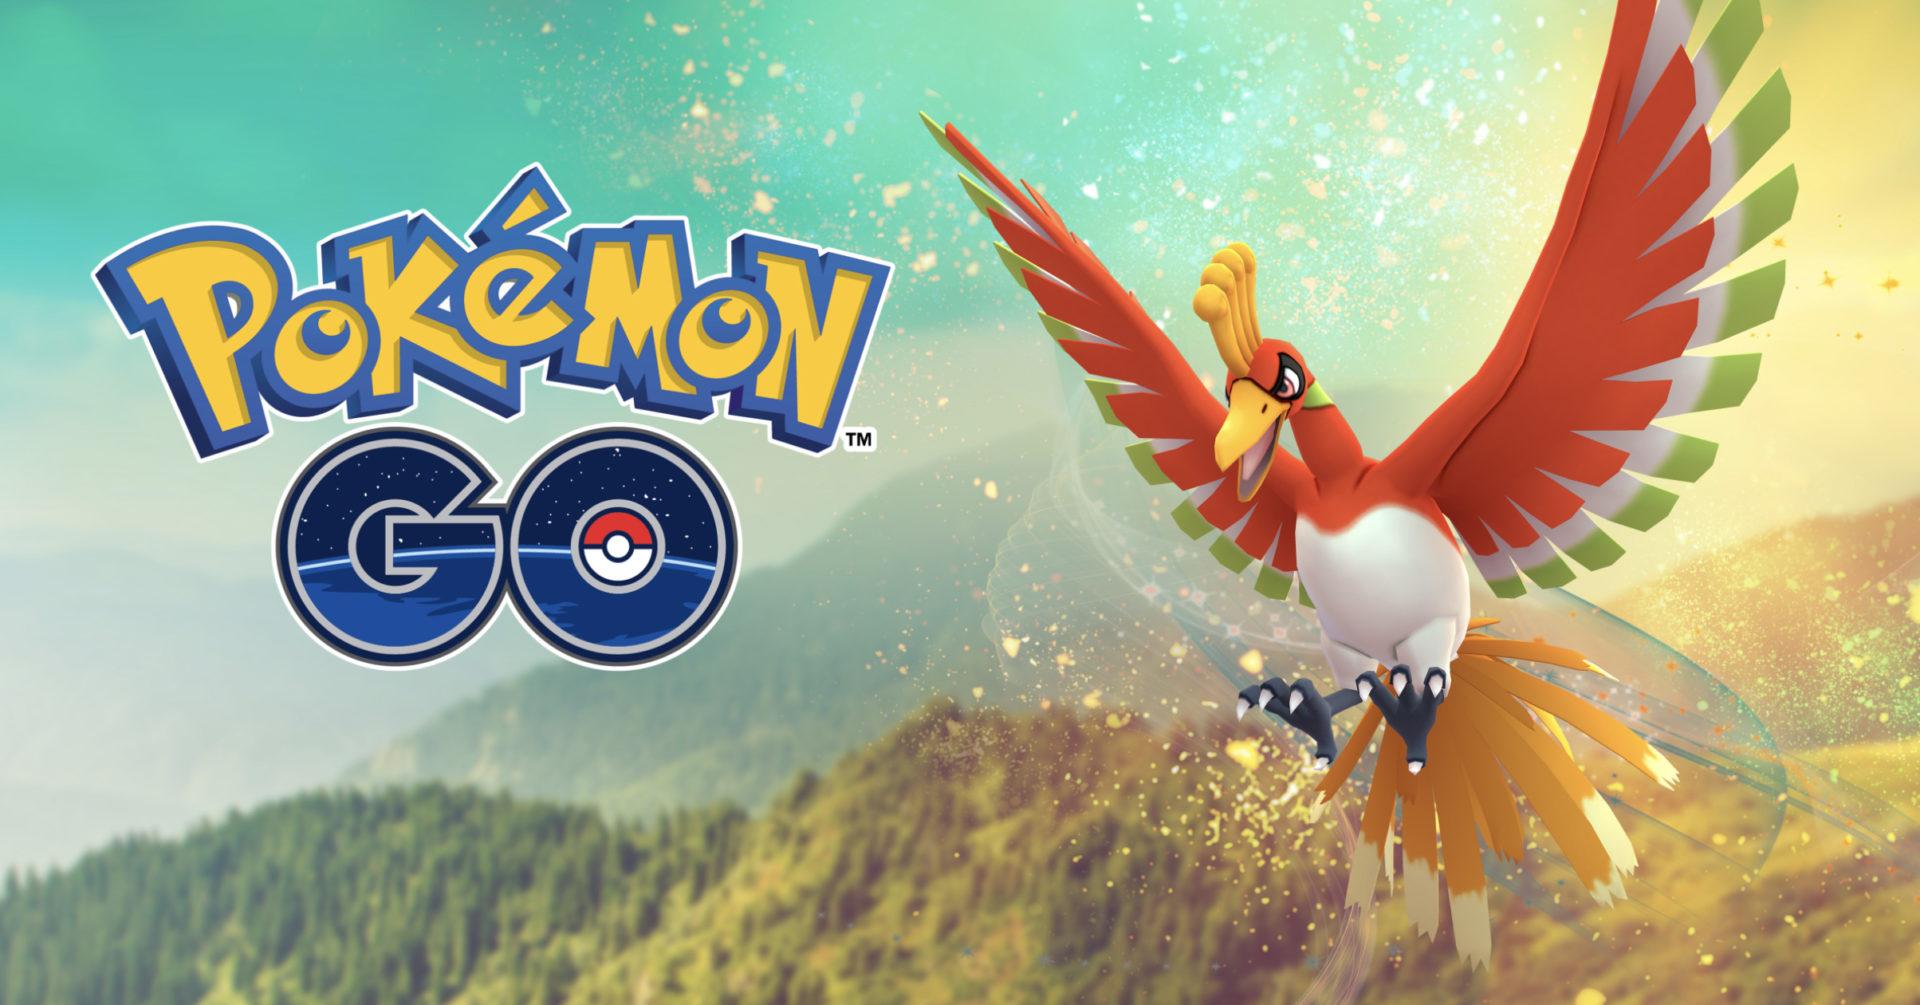 Pokemon Go Screenshot of Gold & Silver Legendary ho-oh promotional.